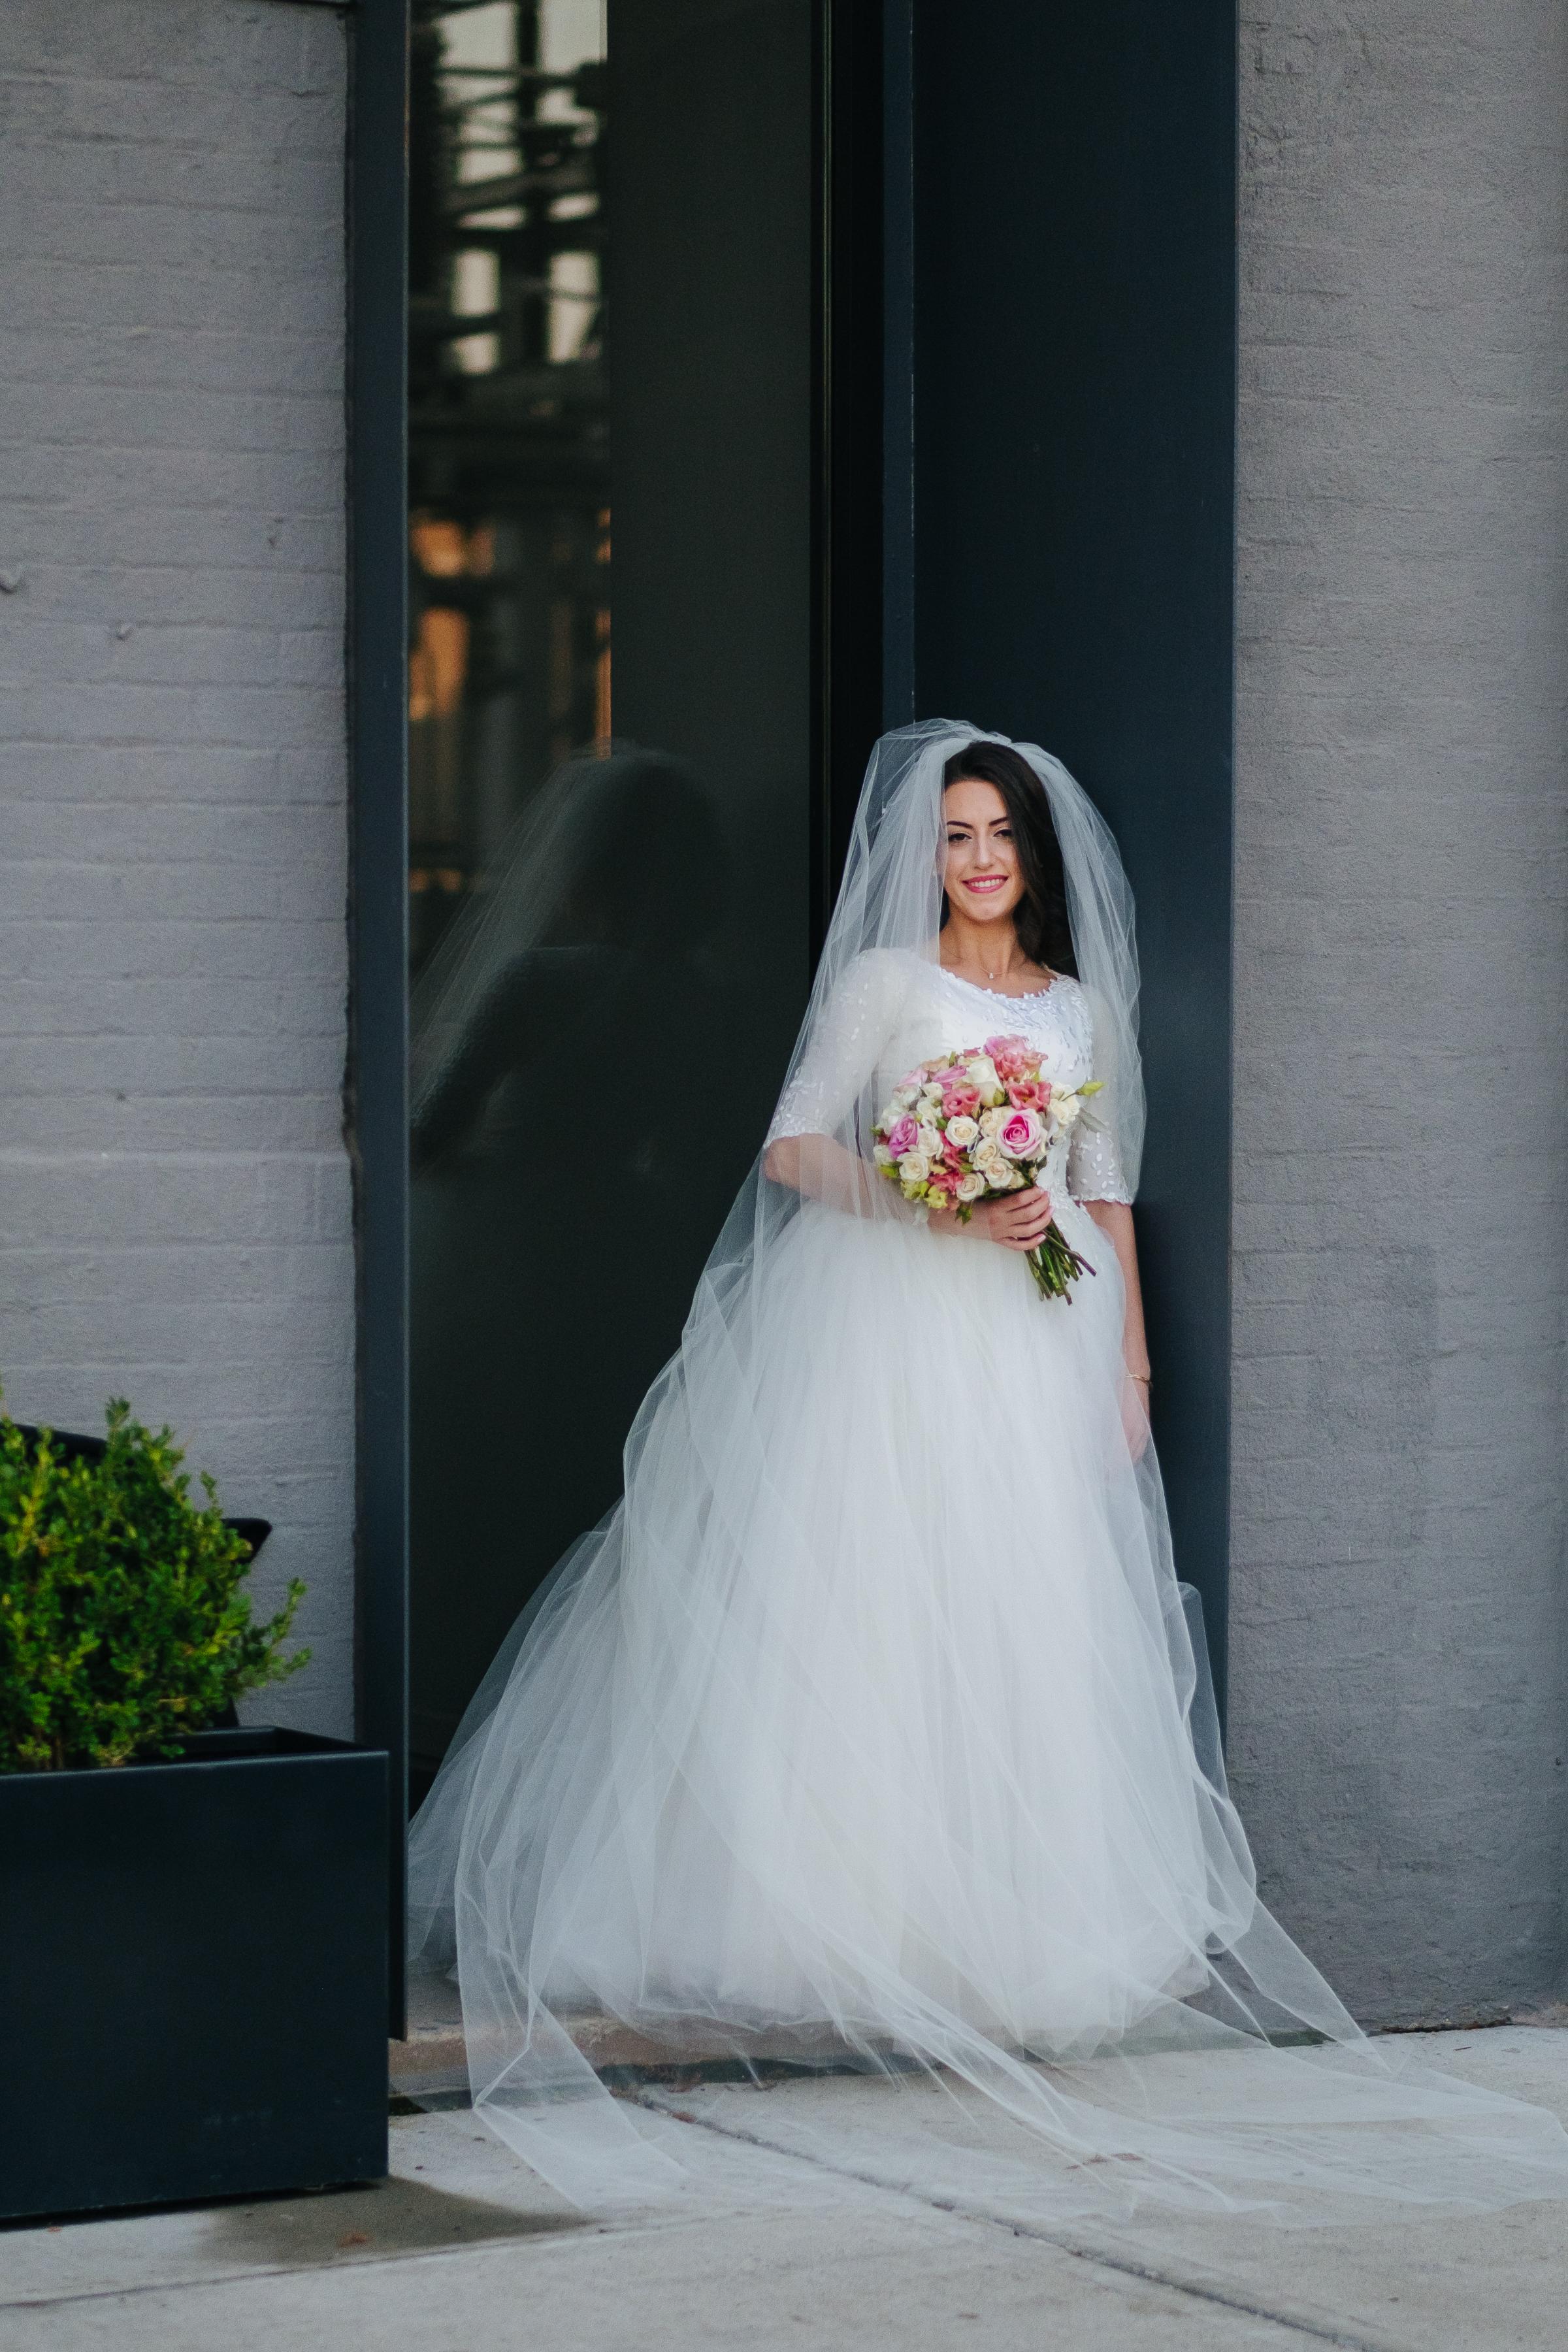 Wedding Yanki & Tzivia - Eliau Piha studio photography-0038.jpg